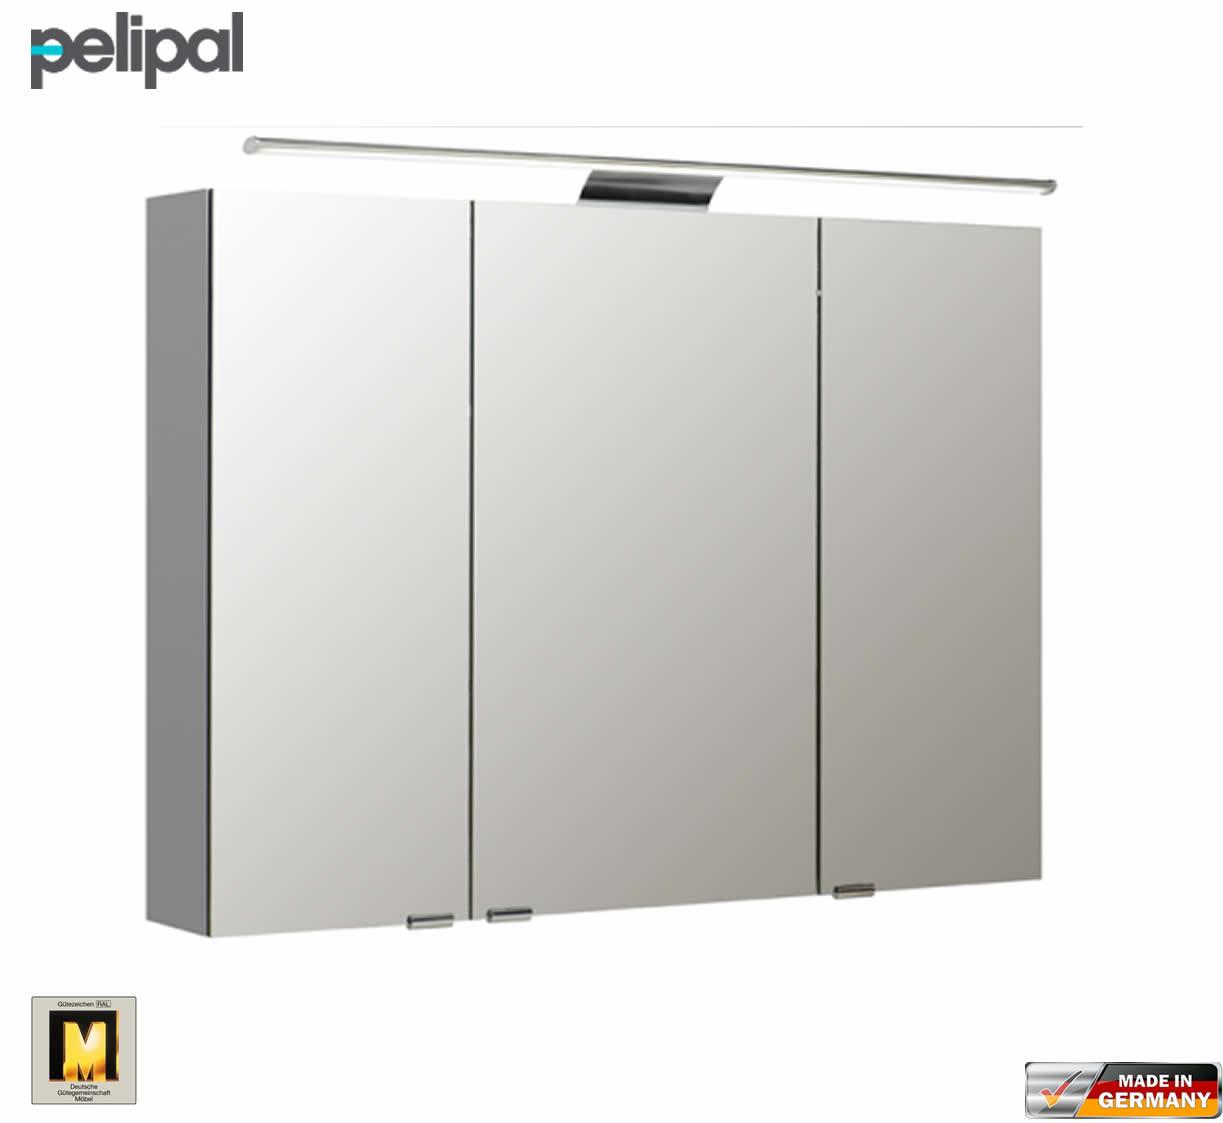 pelipal neutraler spiegelschrank s5 100 cm mit led aufbauleuchte impulsbad. Black Bedroom Furniture Sets. Home Design Ideas